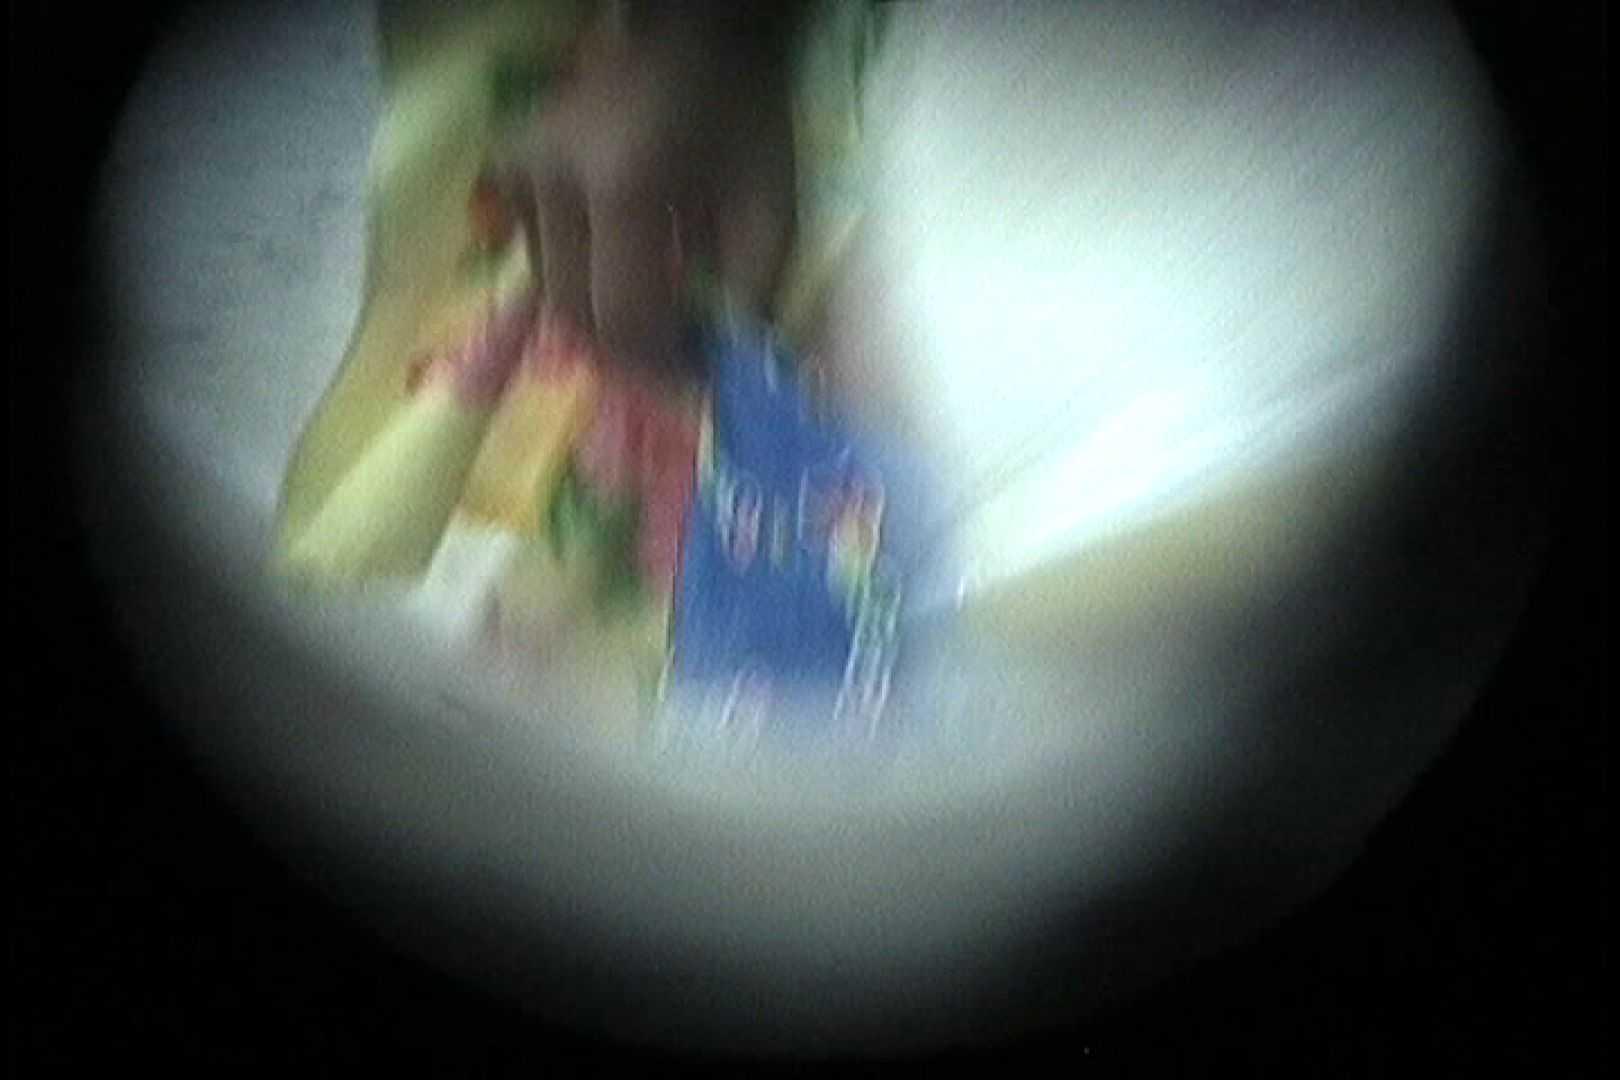 No.22 日焼け跡とオッパイの関係がおかしな貧乳ギャル 乙女  70pic 35